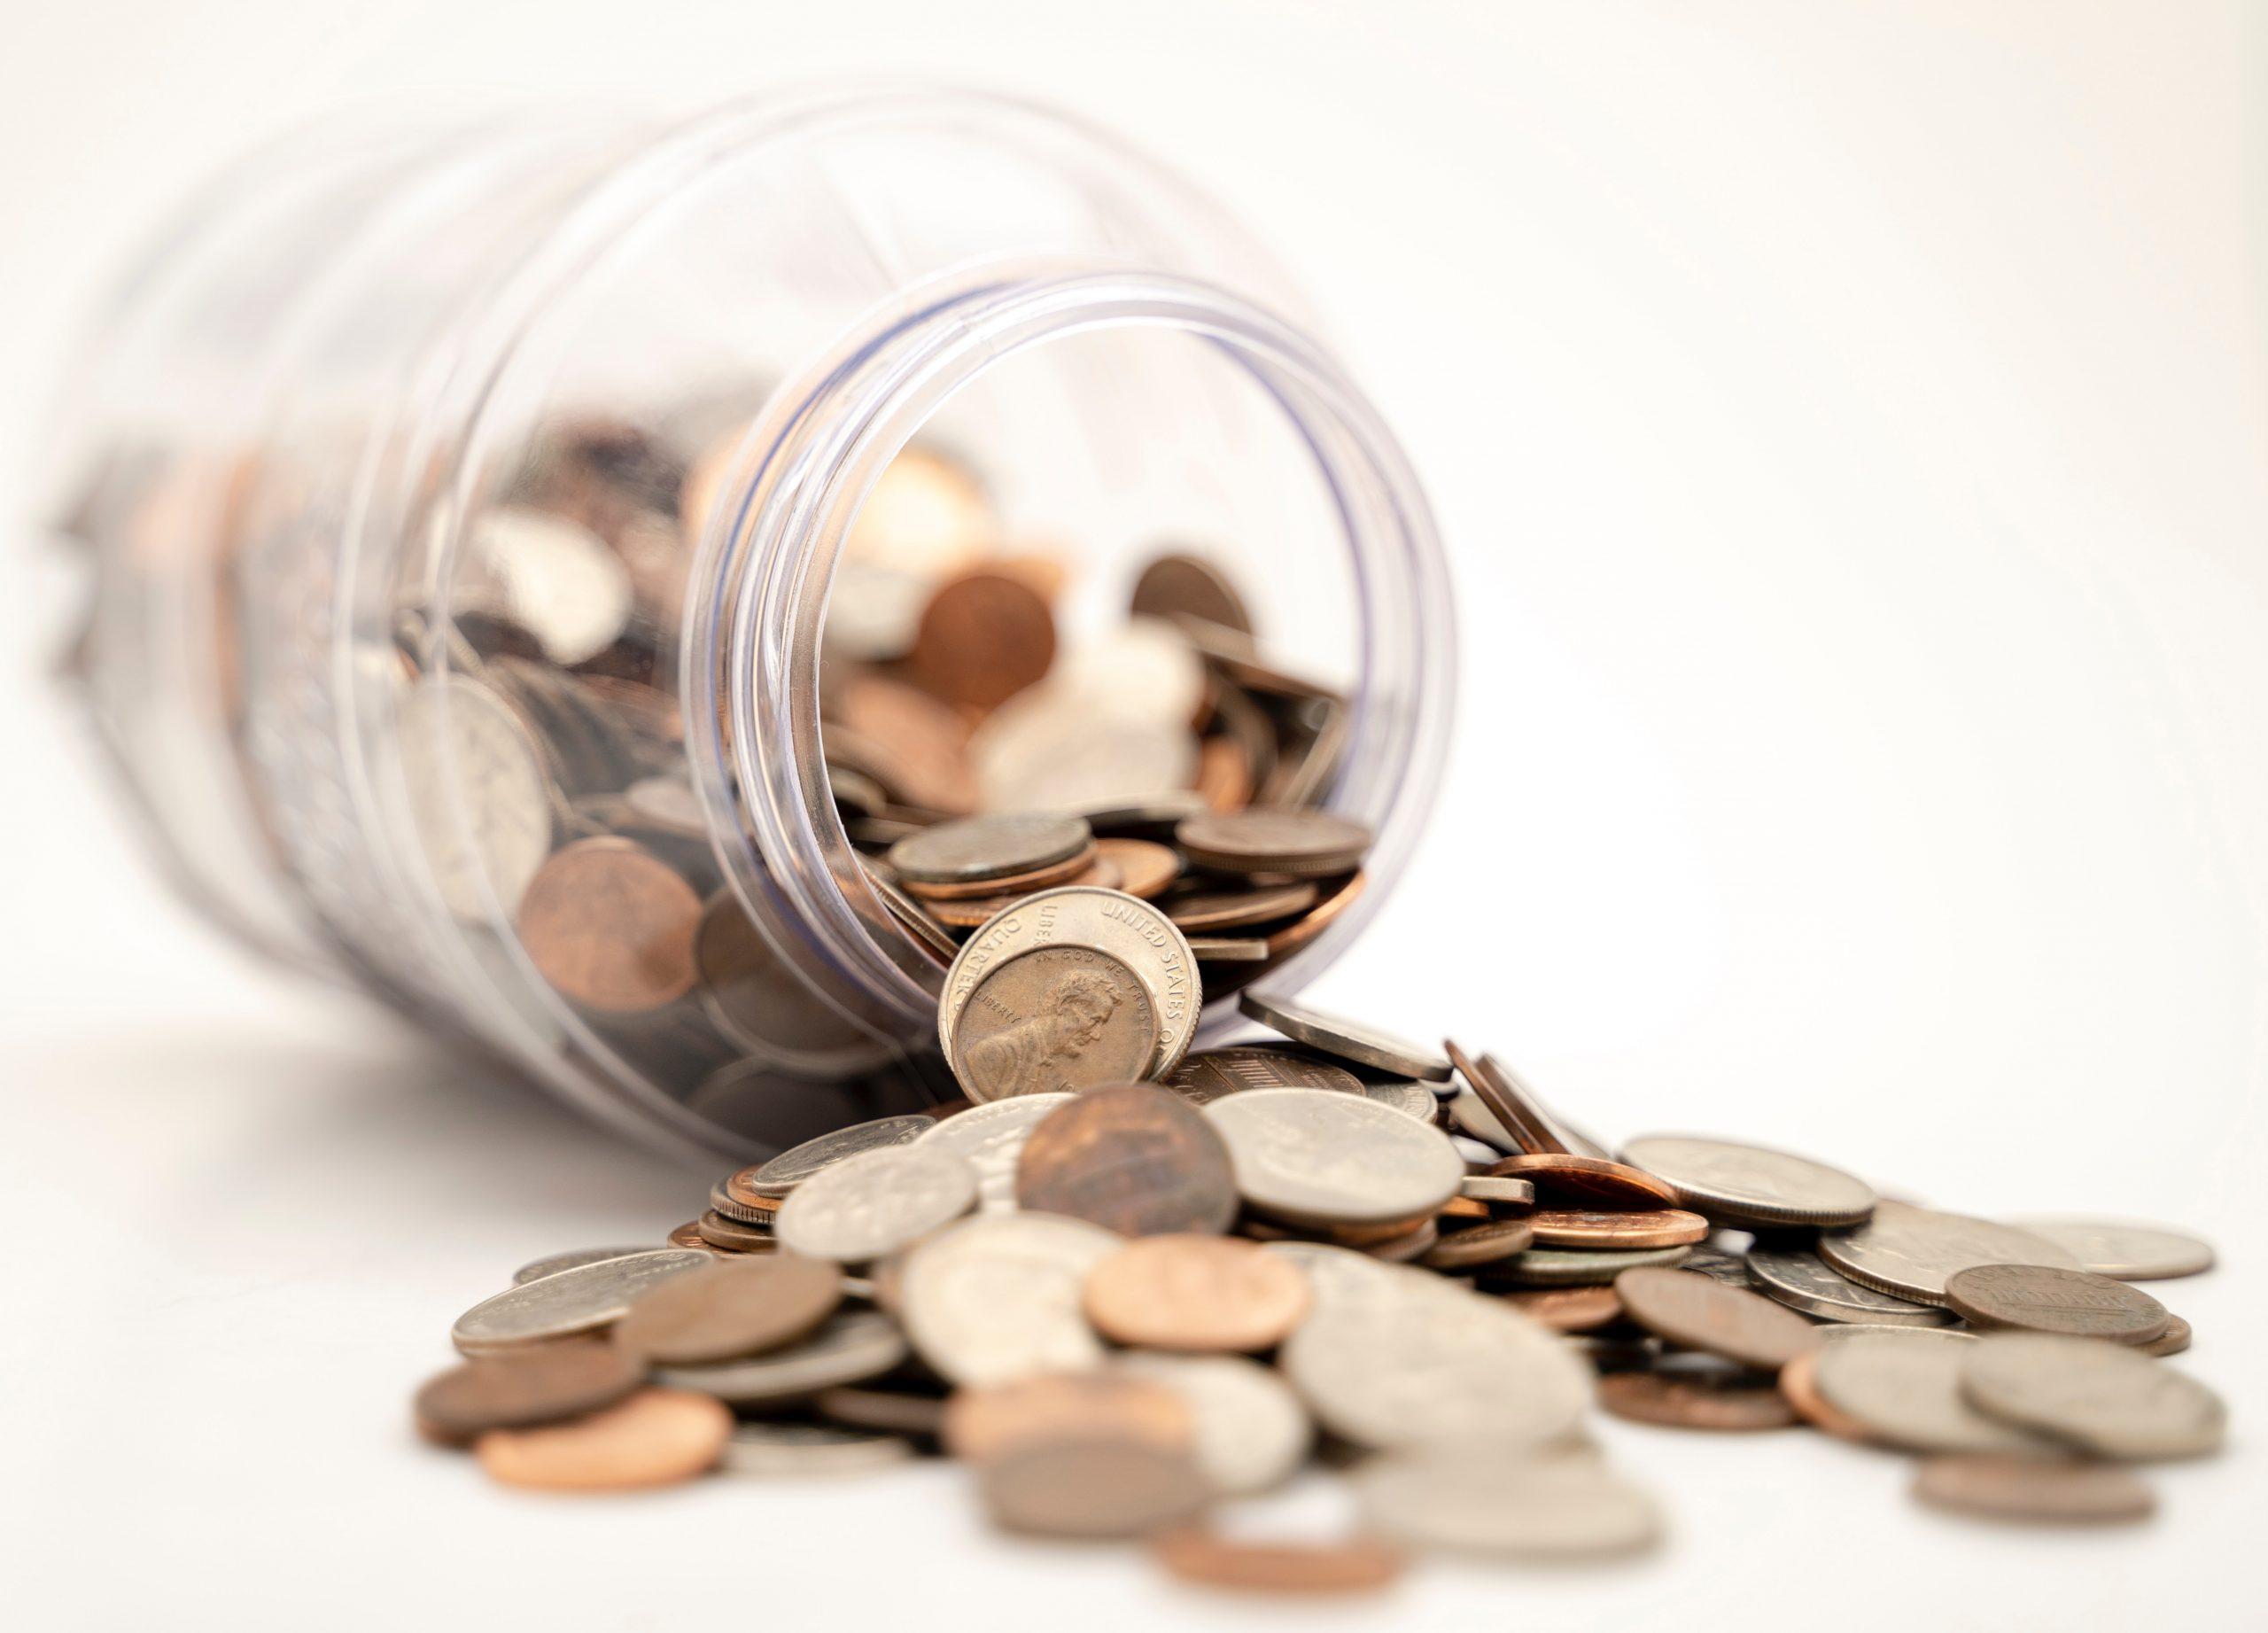 Is graduate school worth the financial strains?